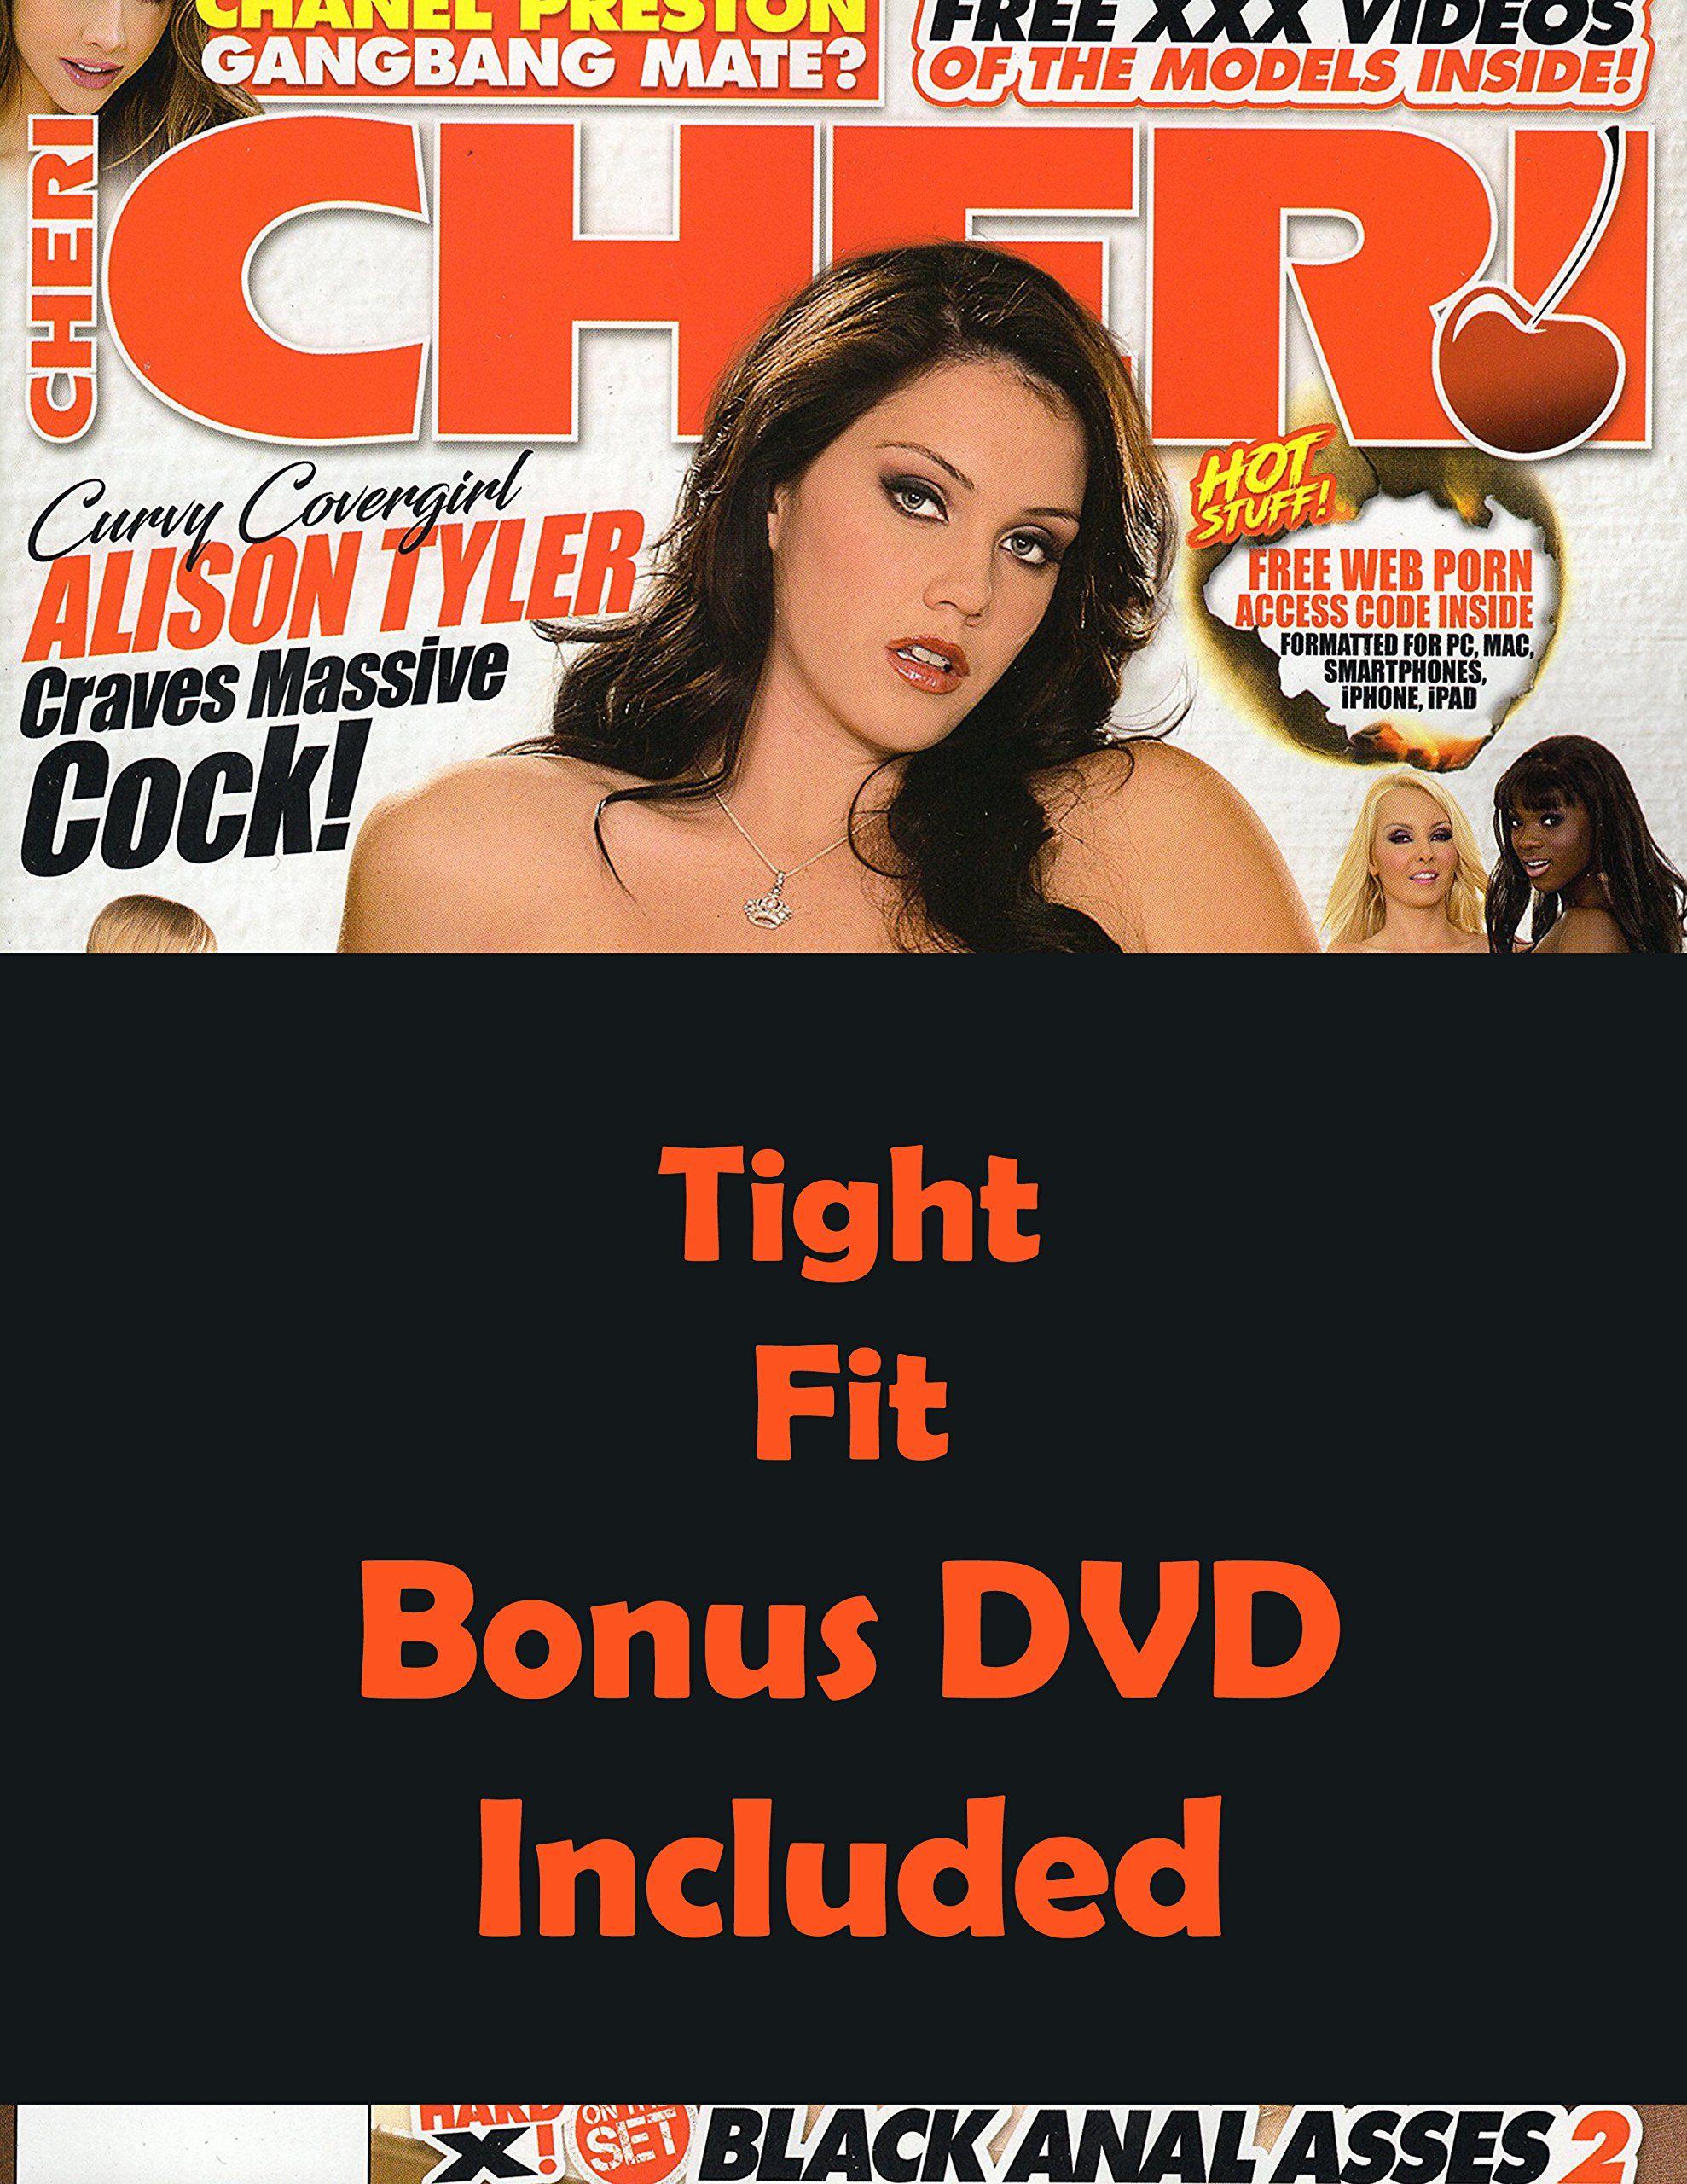 Read Online Alison Tyler Emma Mae Cheri Magazine 2017 256 with Tight Fit Bonus DVD pdf